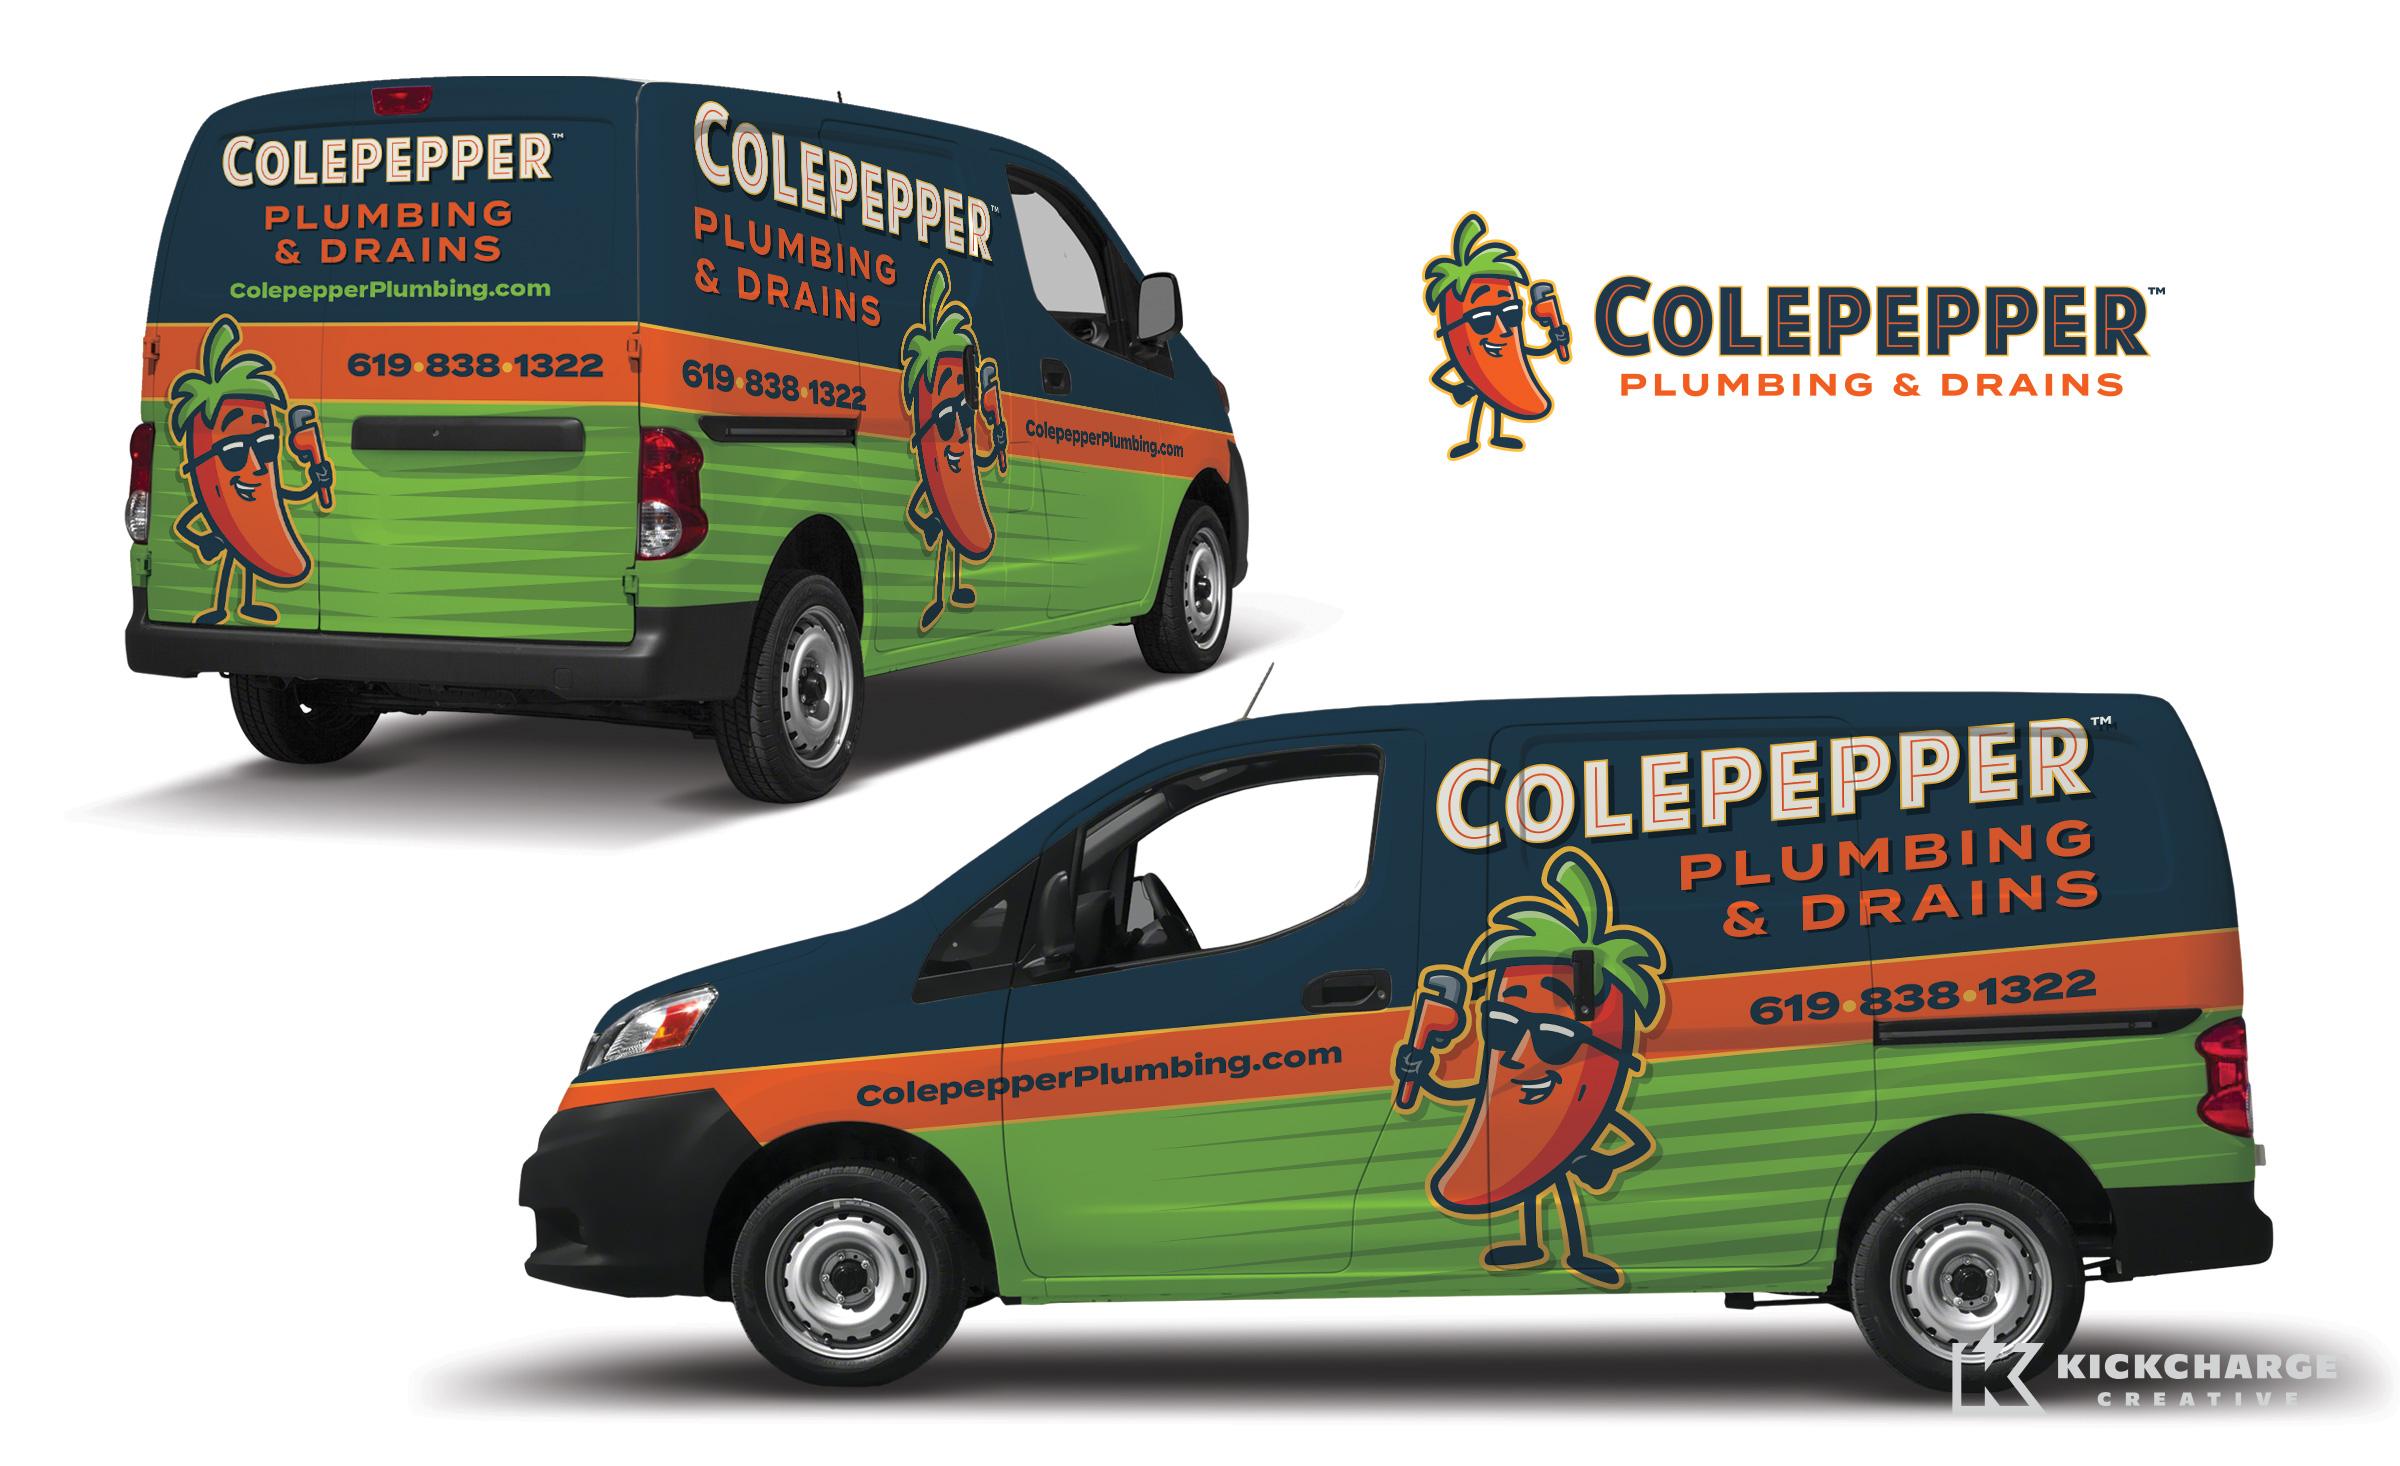 plumbing truck wrap for Colepepper Plumbing & Drains